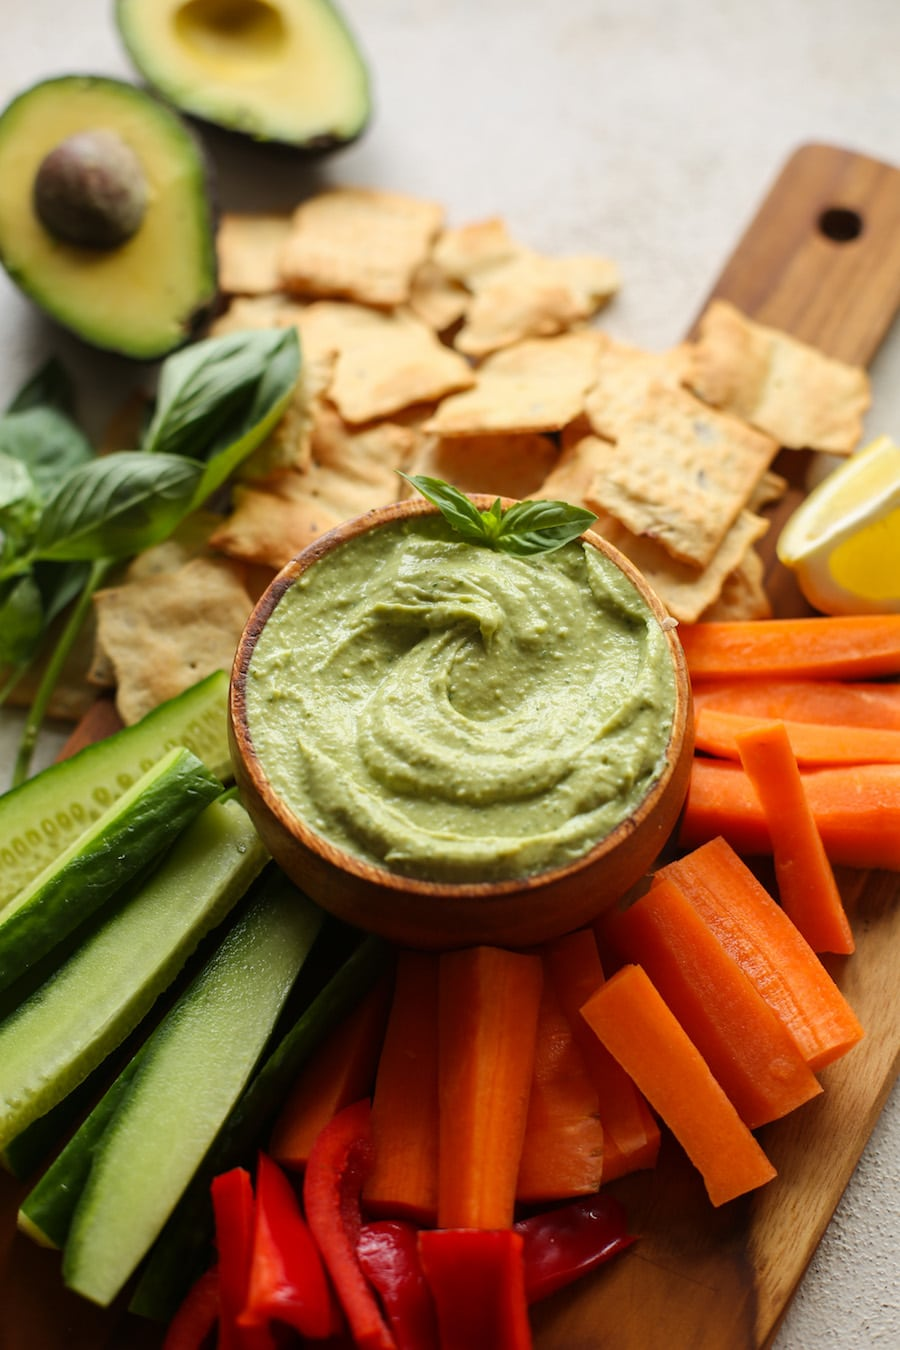 Creamy Basil Avocado Dip made with avocado, lemon juice, garlic, tahini, sea salt & fresh basil.   Gluten Free + Vegan + Paleo